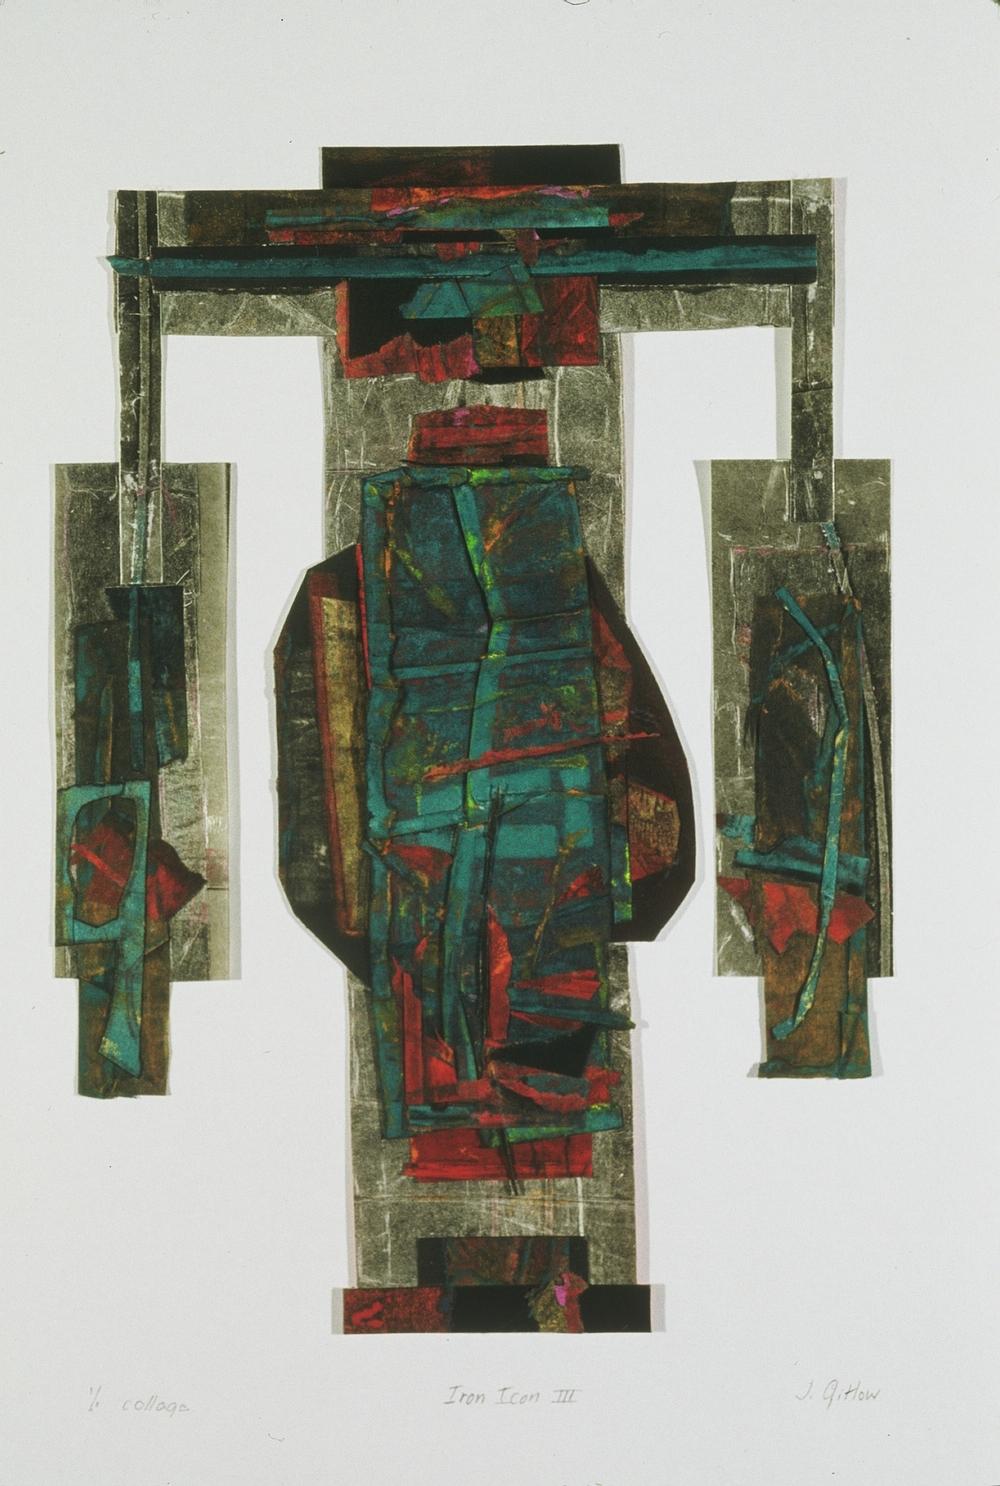 Iron Icon III